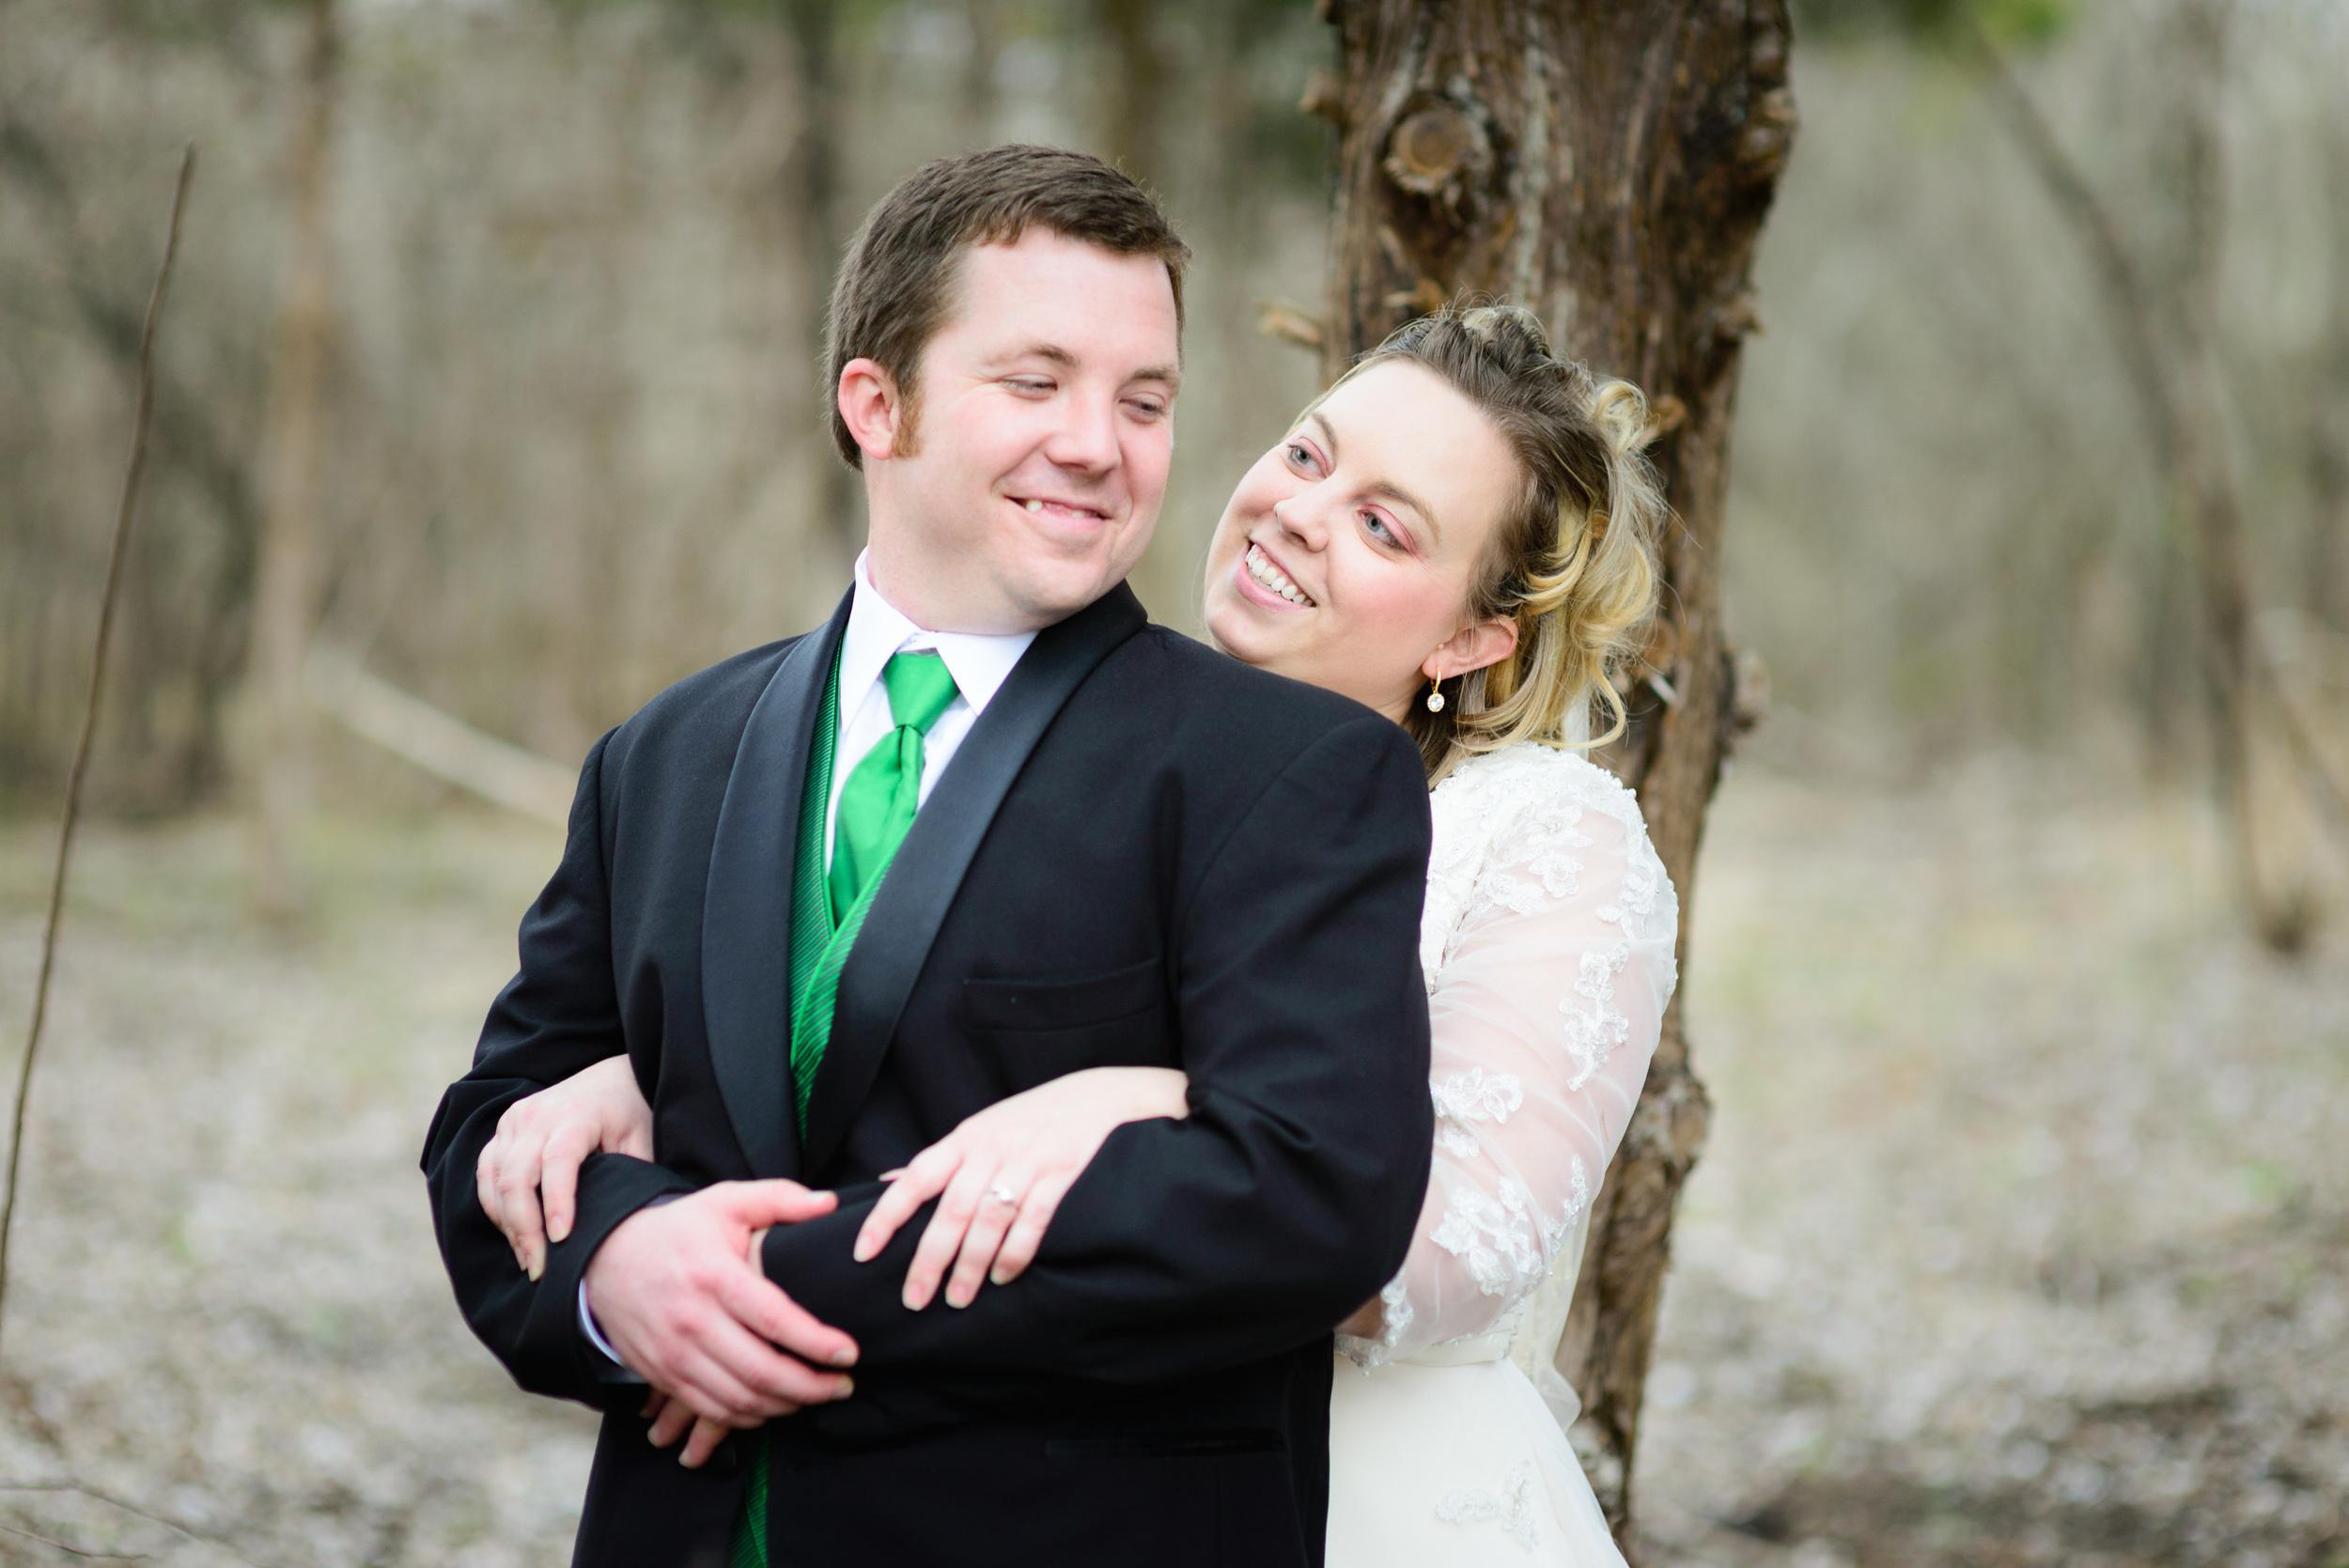 Clint and Ericka Wedding 2015